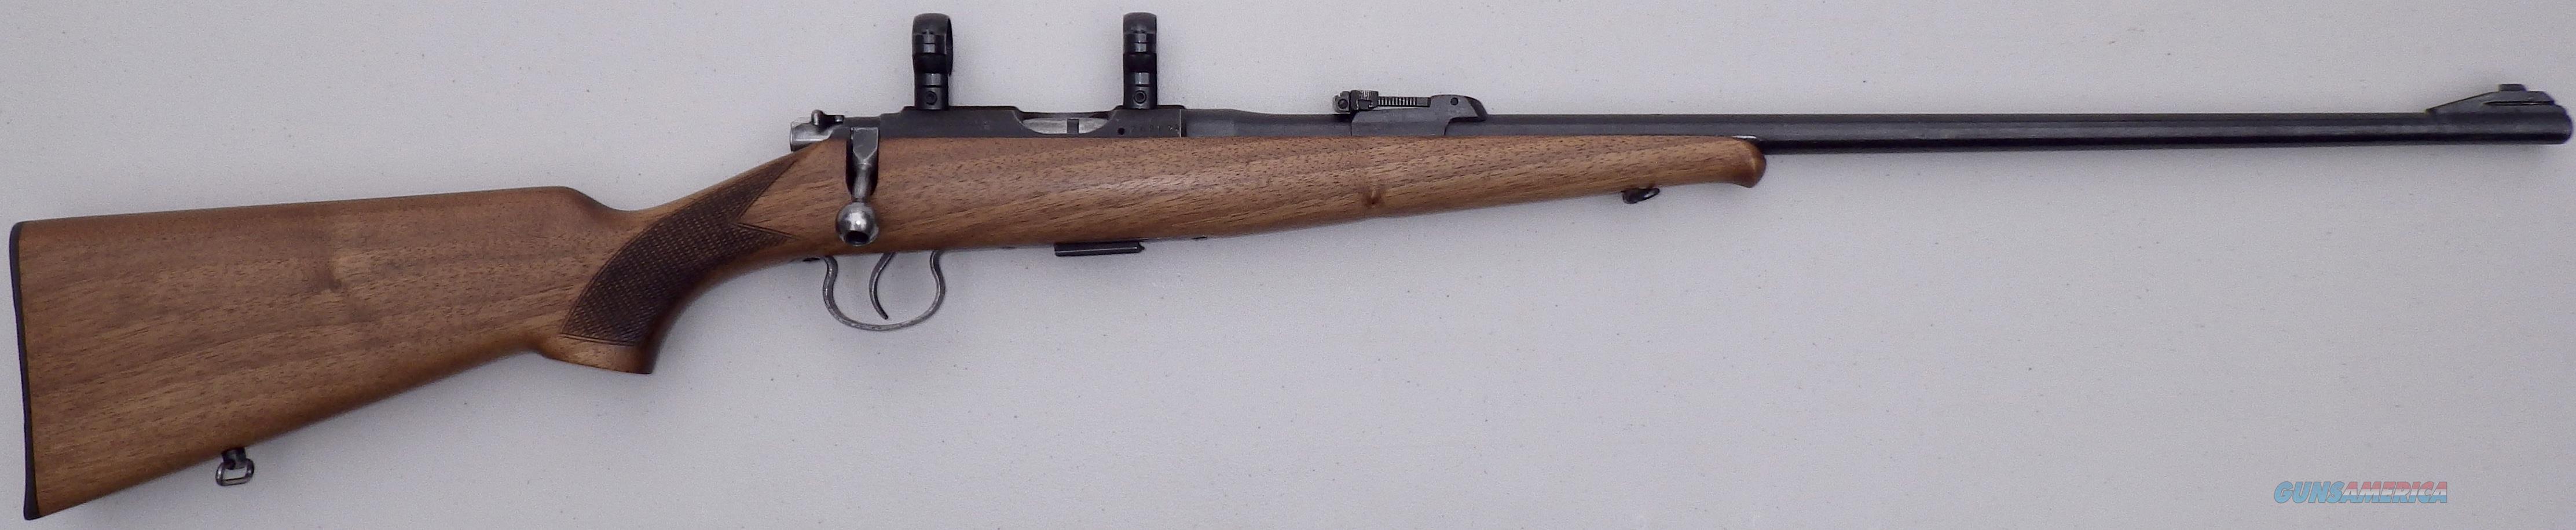 CZ / BRNO Model 2  22 LR, 1977, CAI, sights, rings, great bore